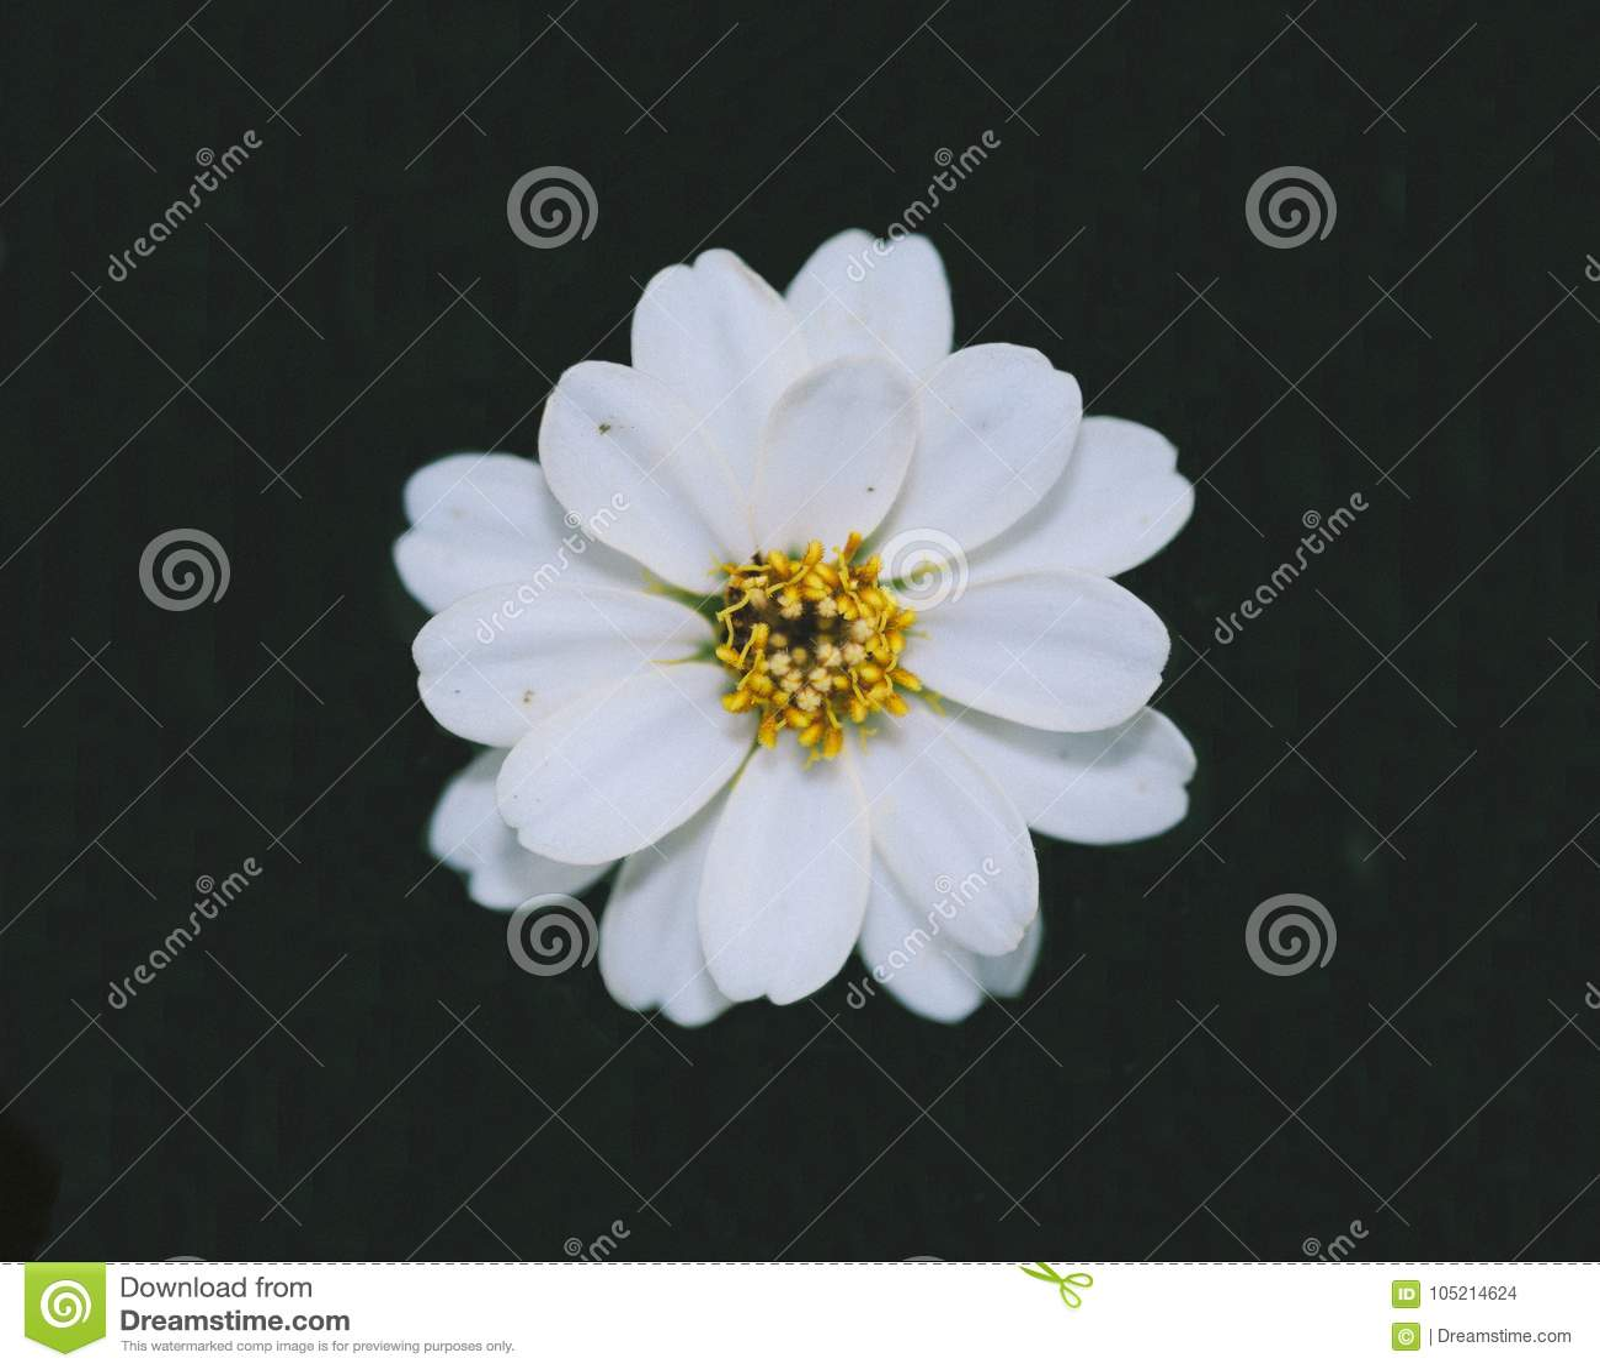 Pleasing look of beautiful zinnia flower blooming in green background